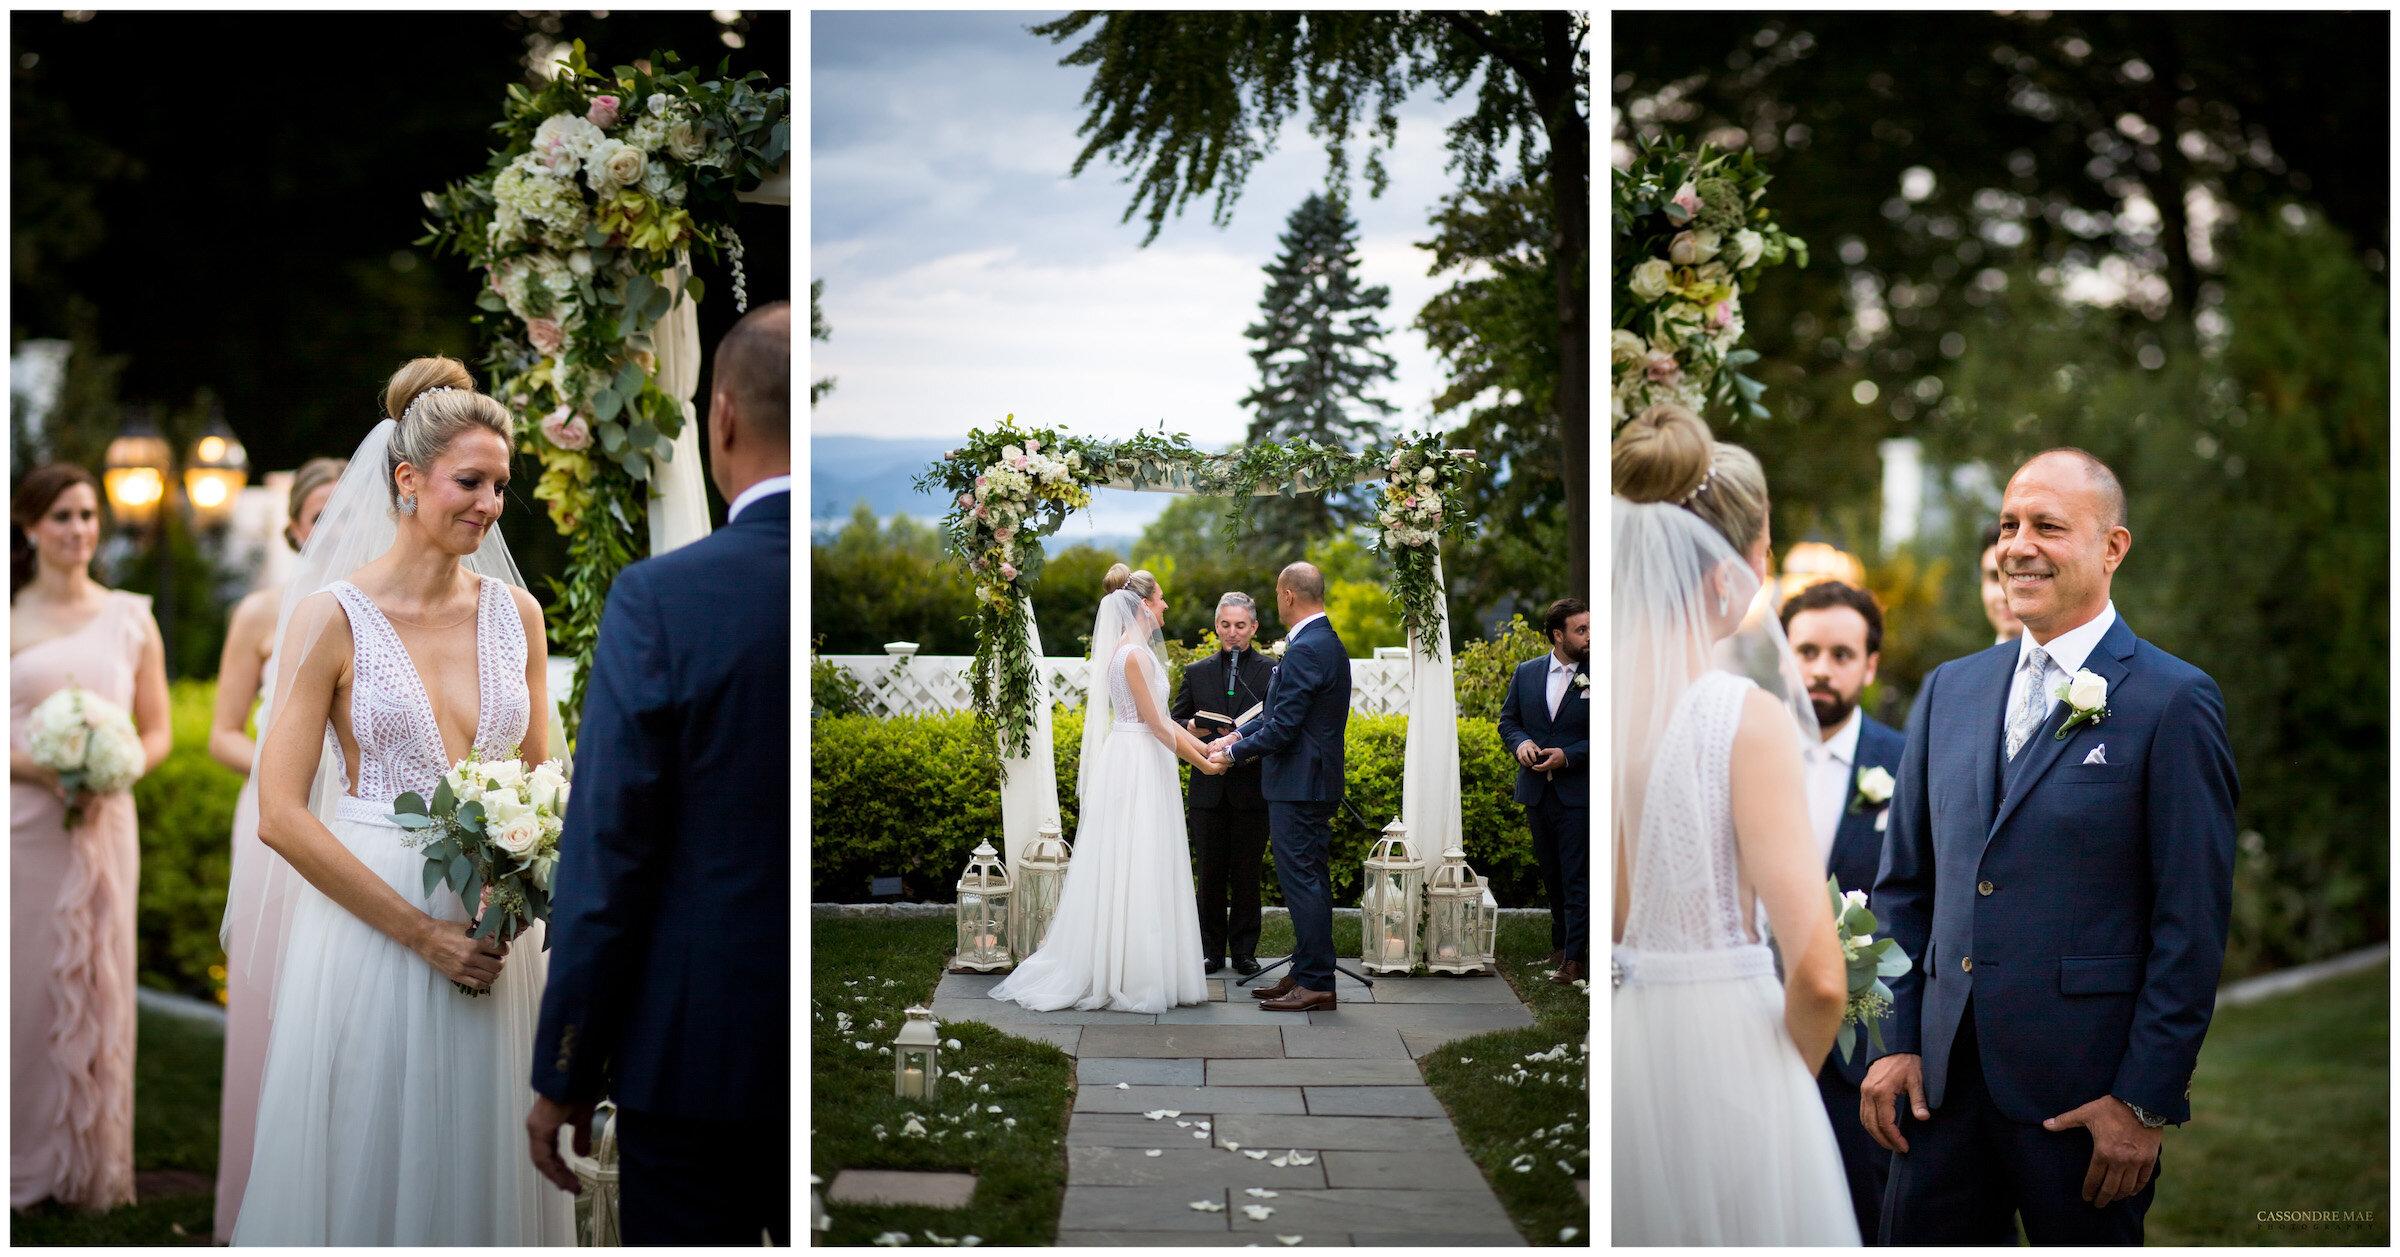 Cassondre Mae Photography Briarcliff Manor Wedding Photographer 9.jpg